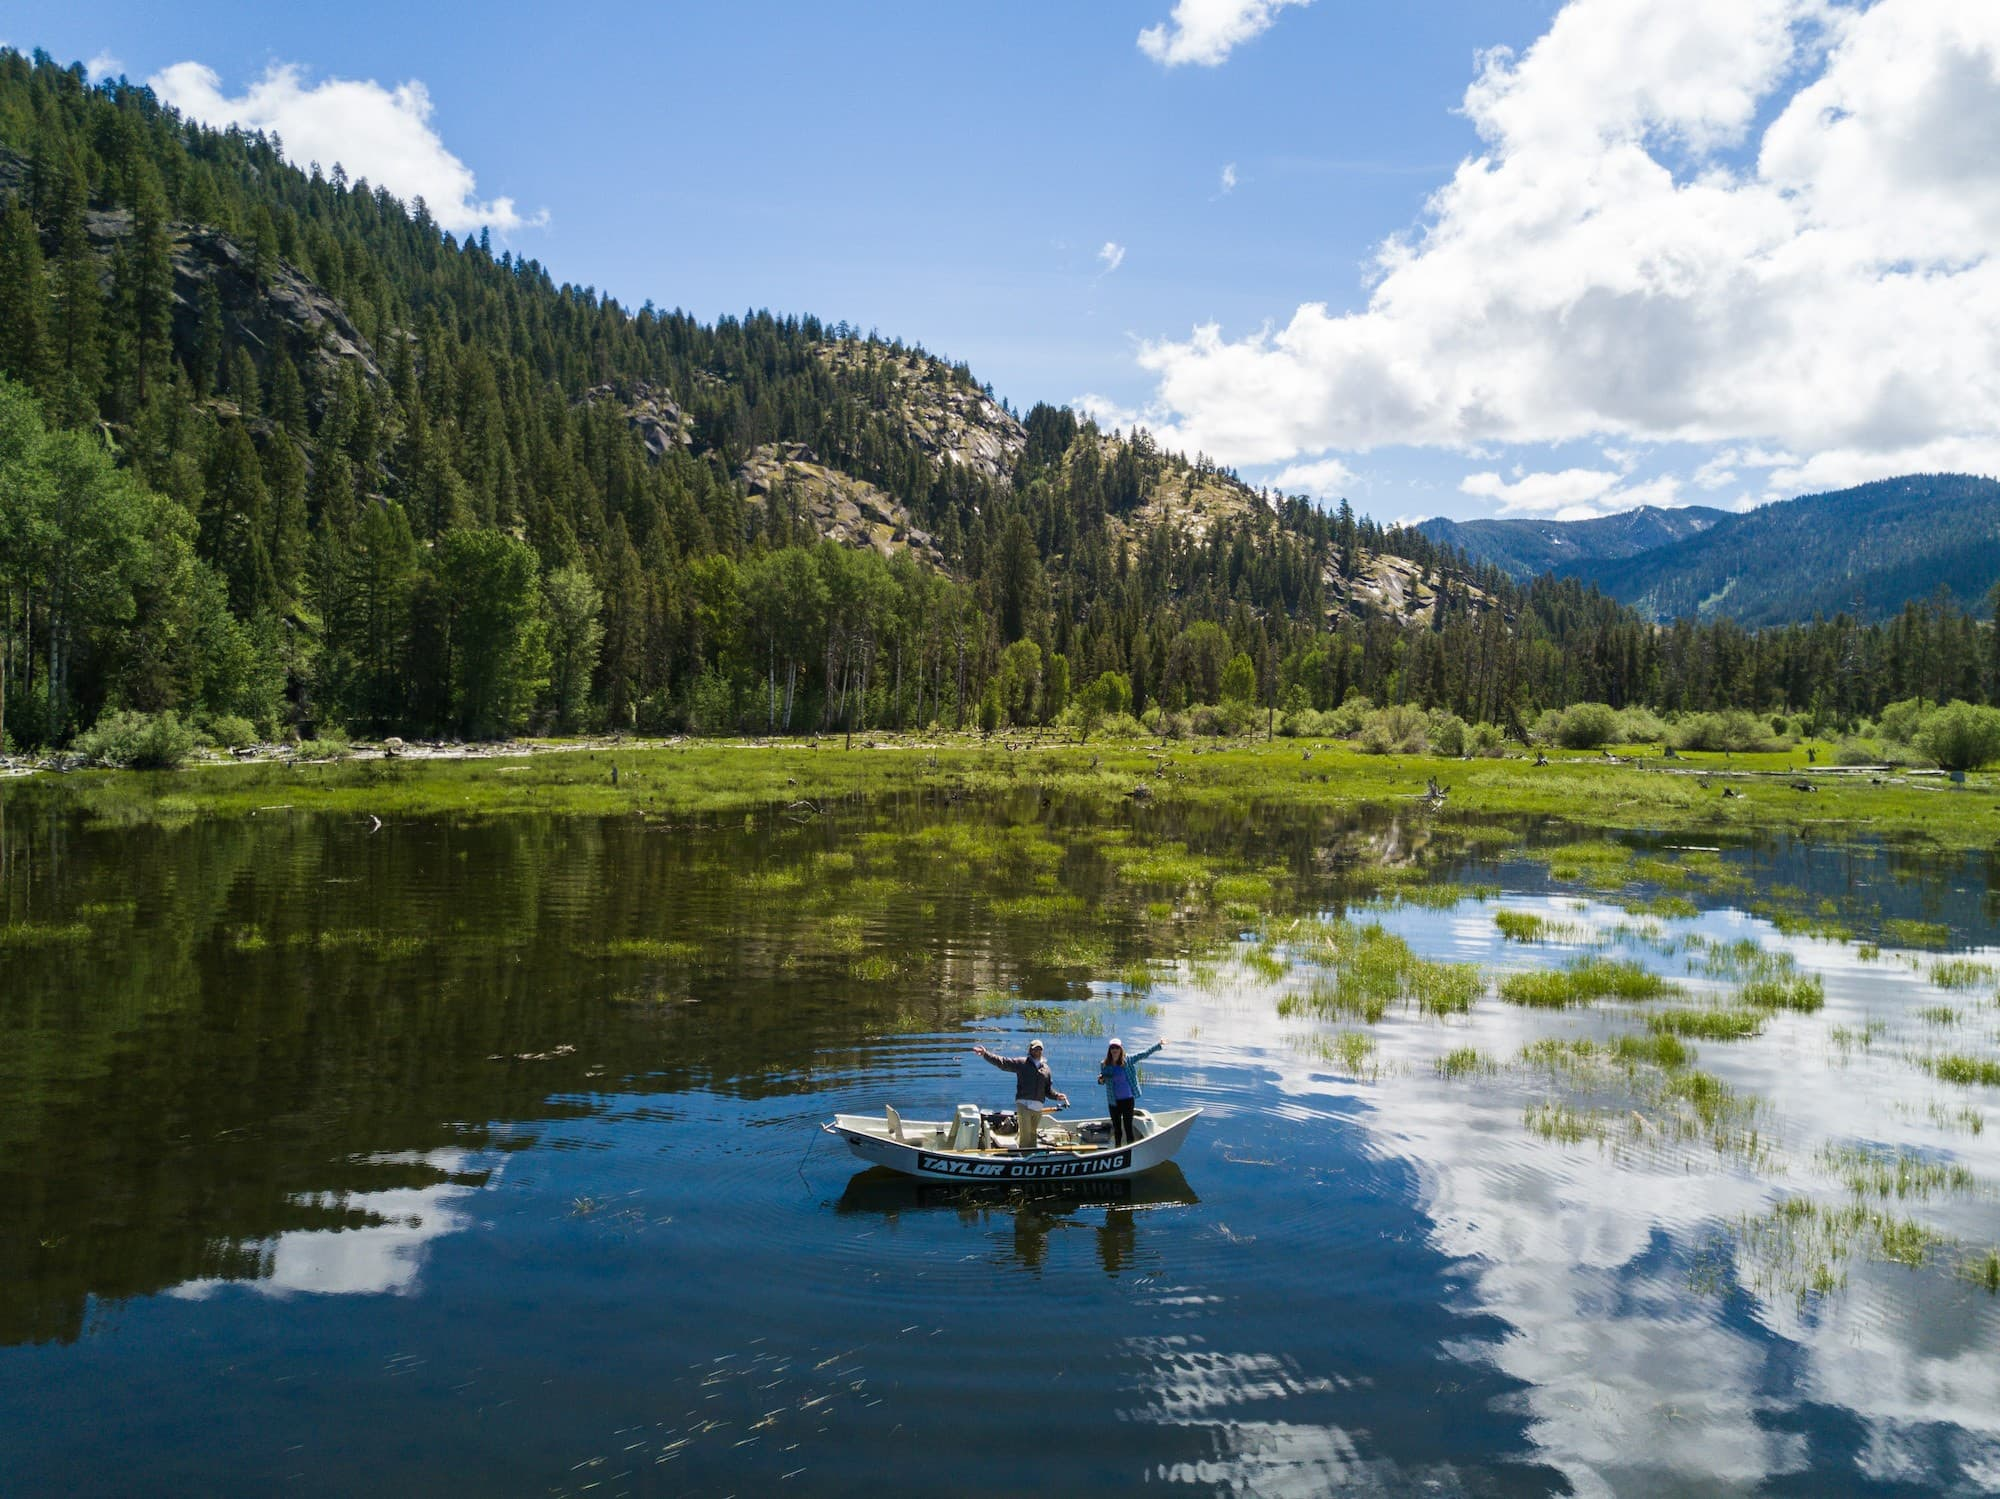 Fly Fishing in McCall Idaho